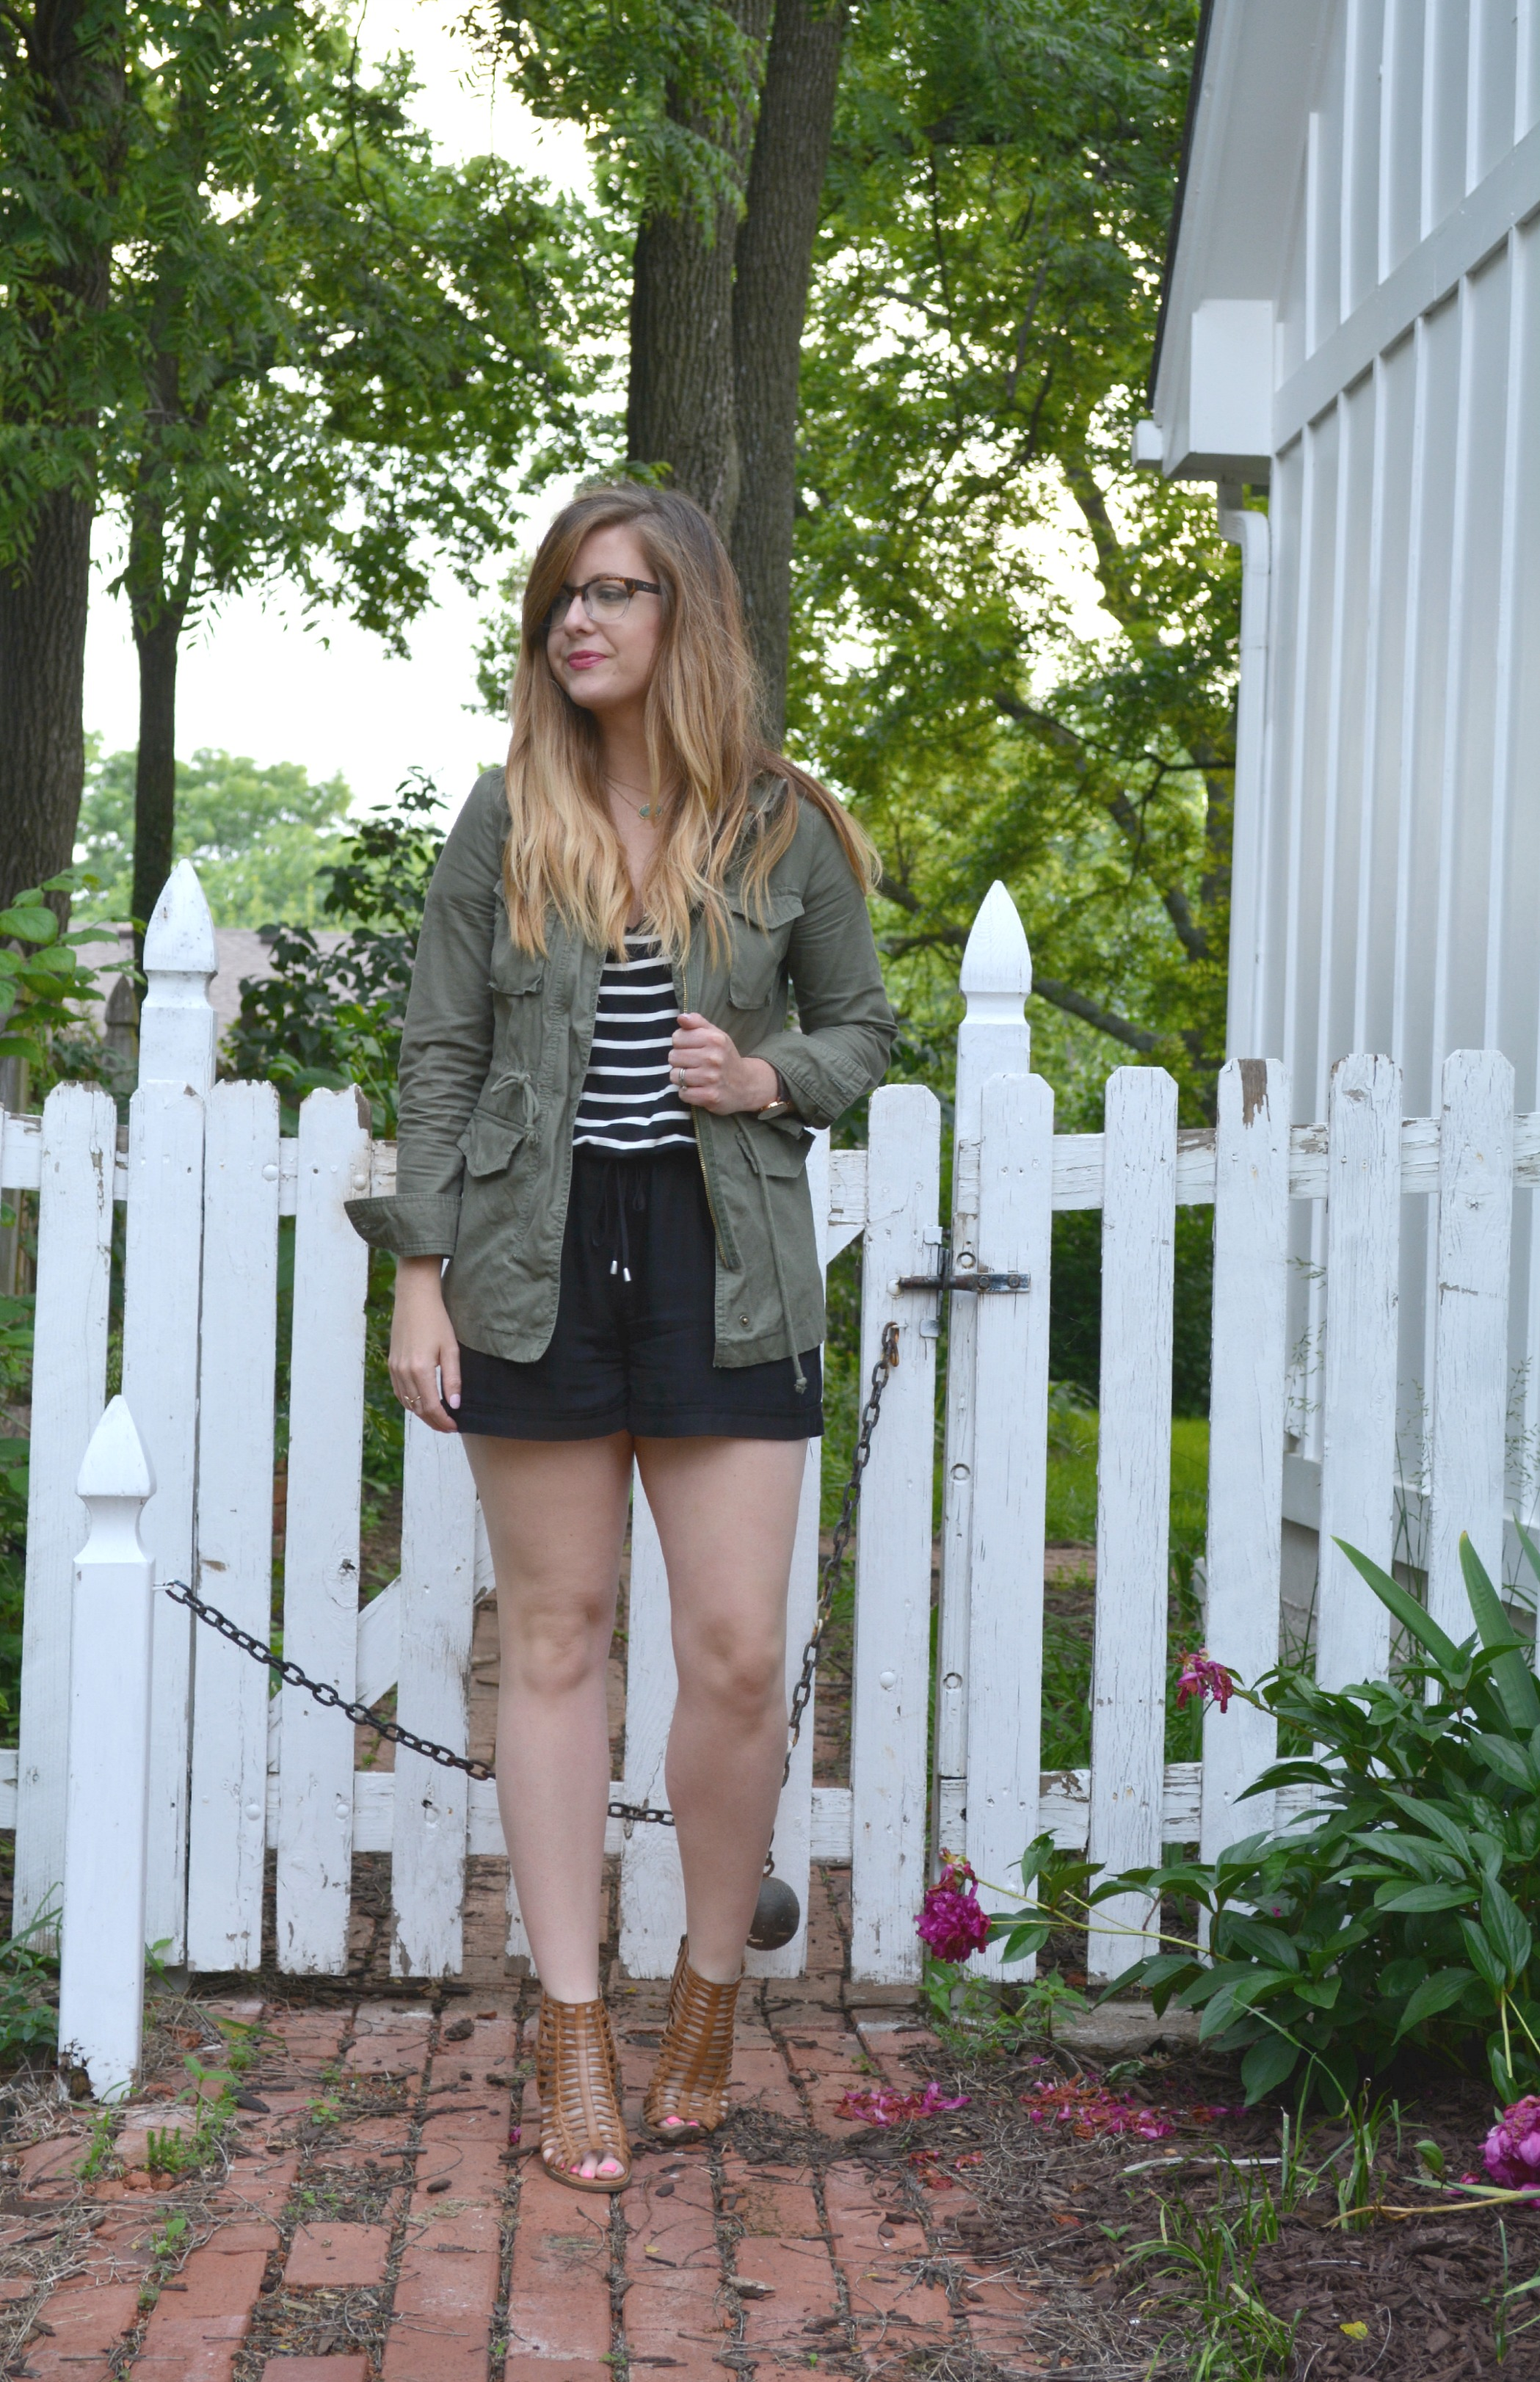 Polette eyewear, green cargo jacket, and stripe Anthropologie romper on Sophisticaited.com